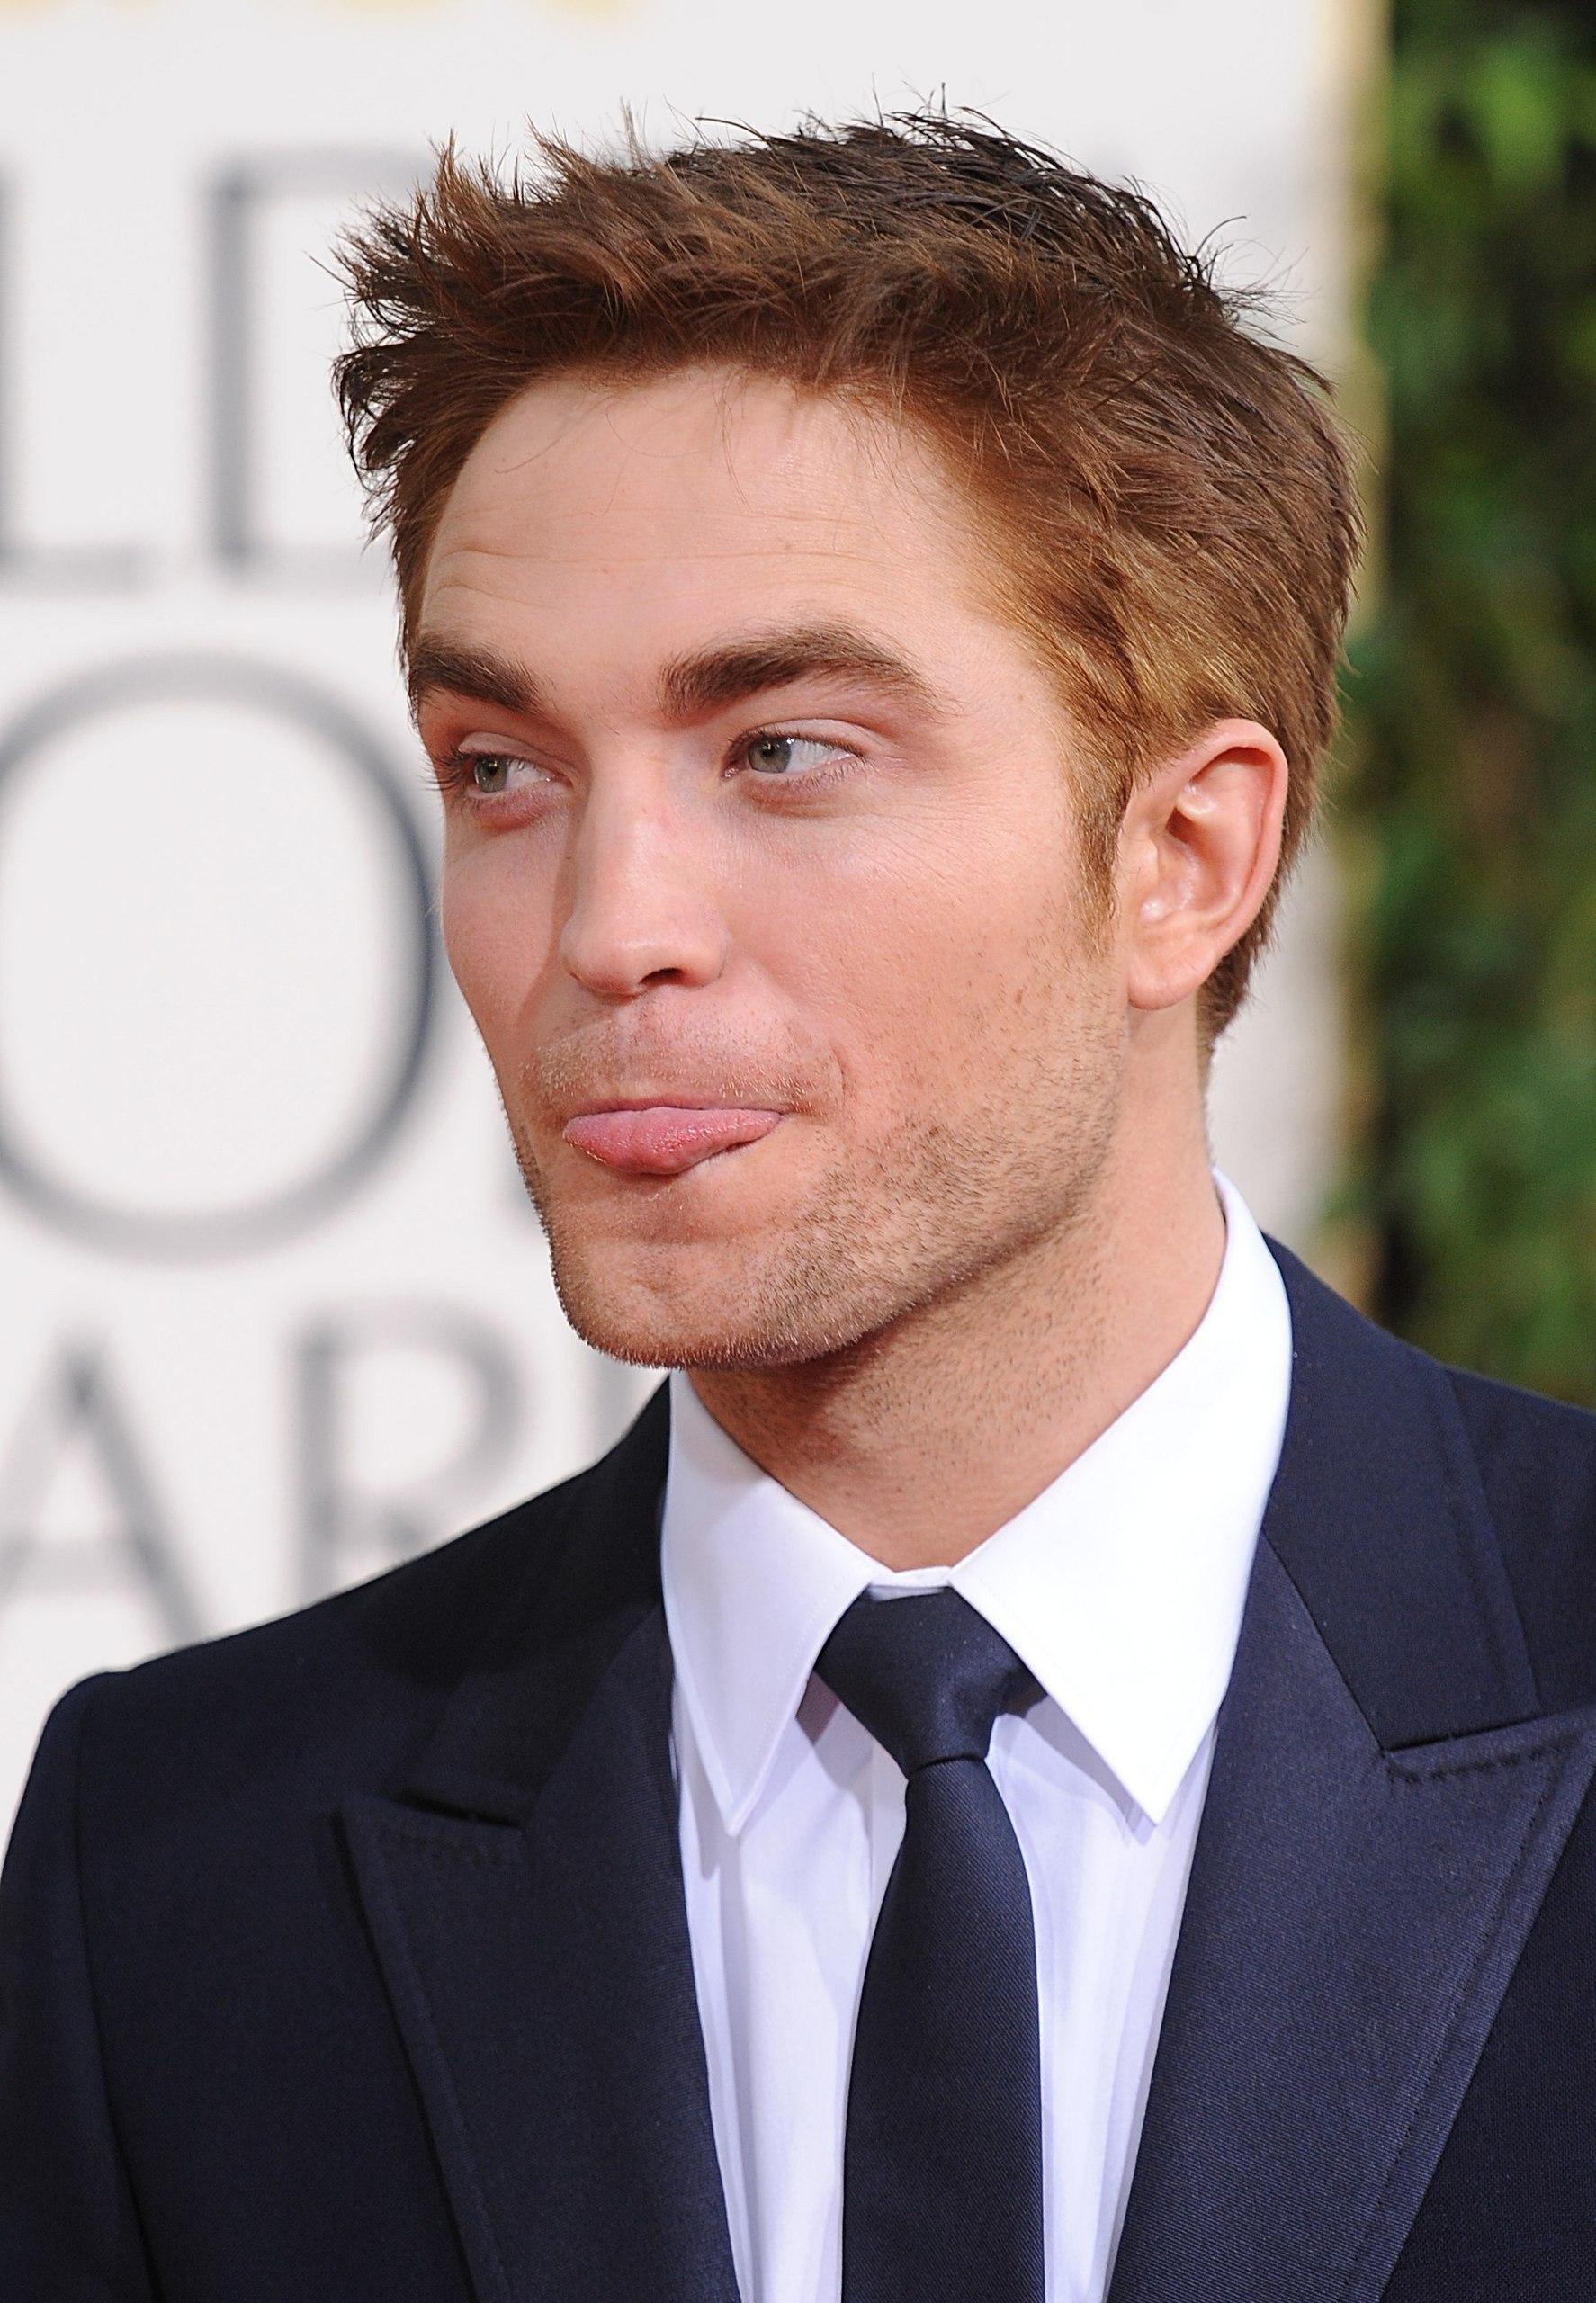 68th Golden Globes Awards 2011 [HQ]